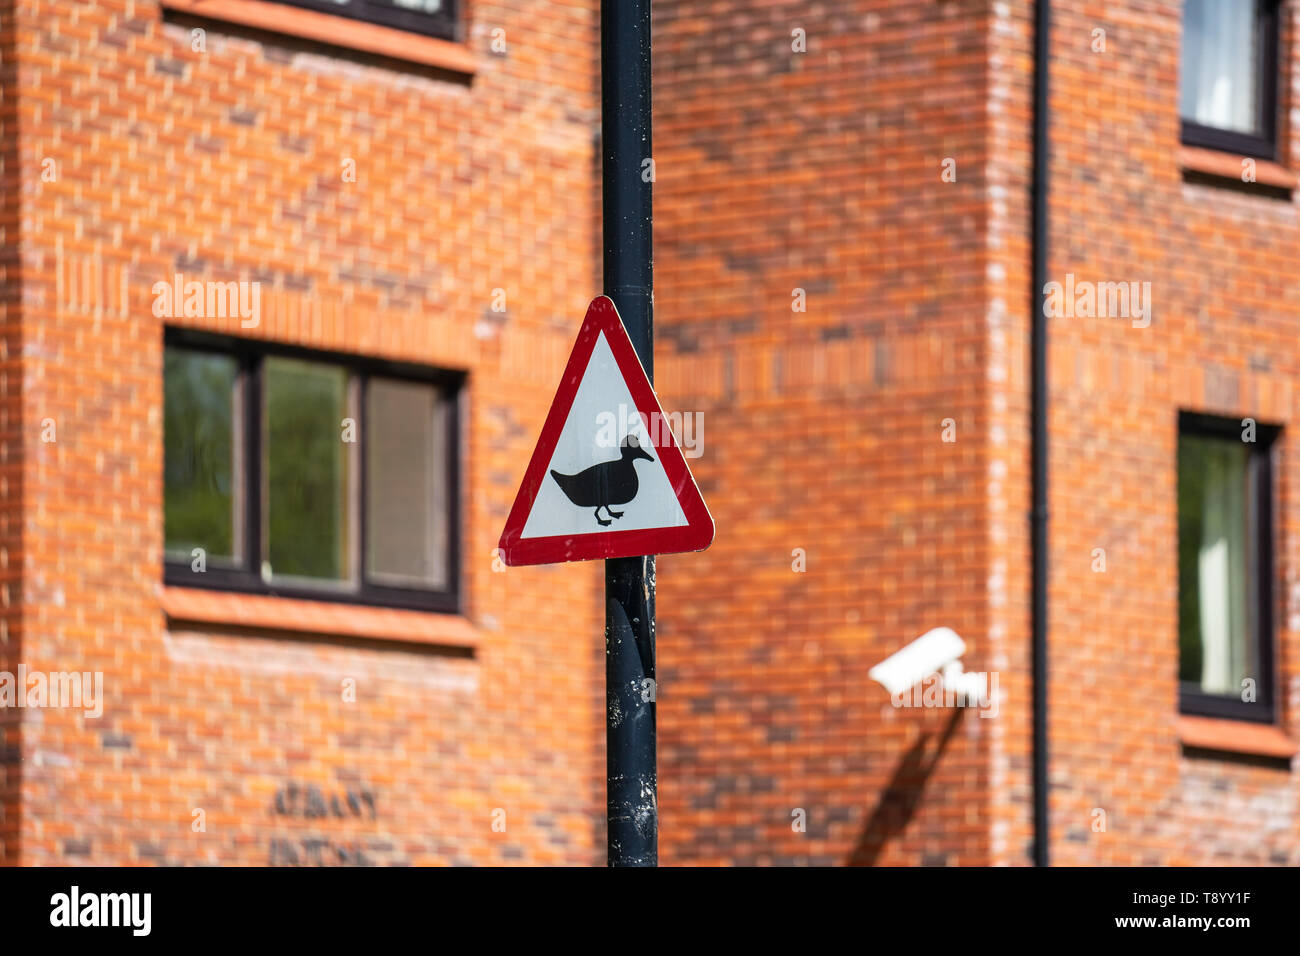 Caution Ducks Crossing Uk Road Traffic Sign. - Stock Image